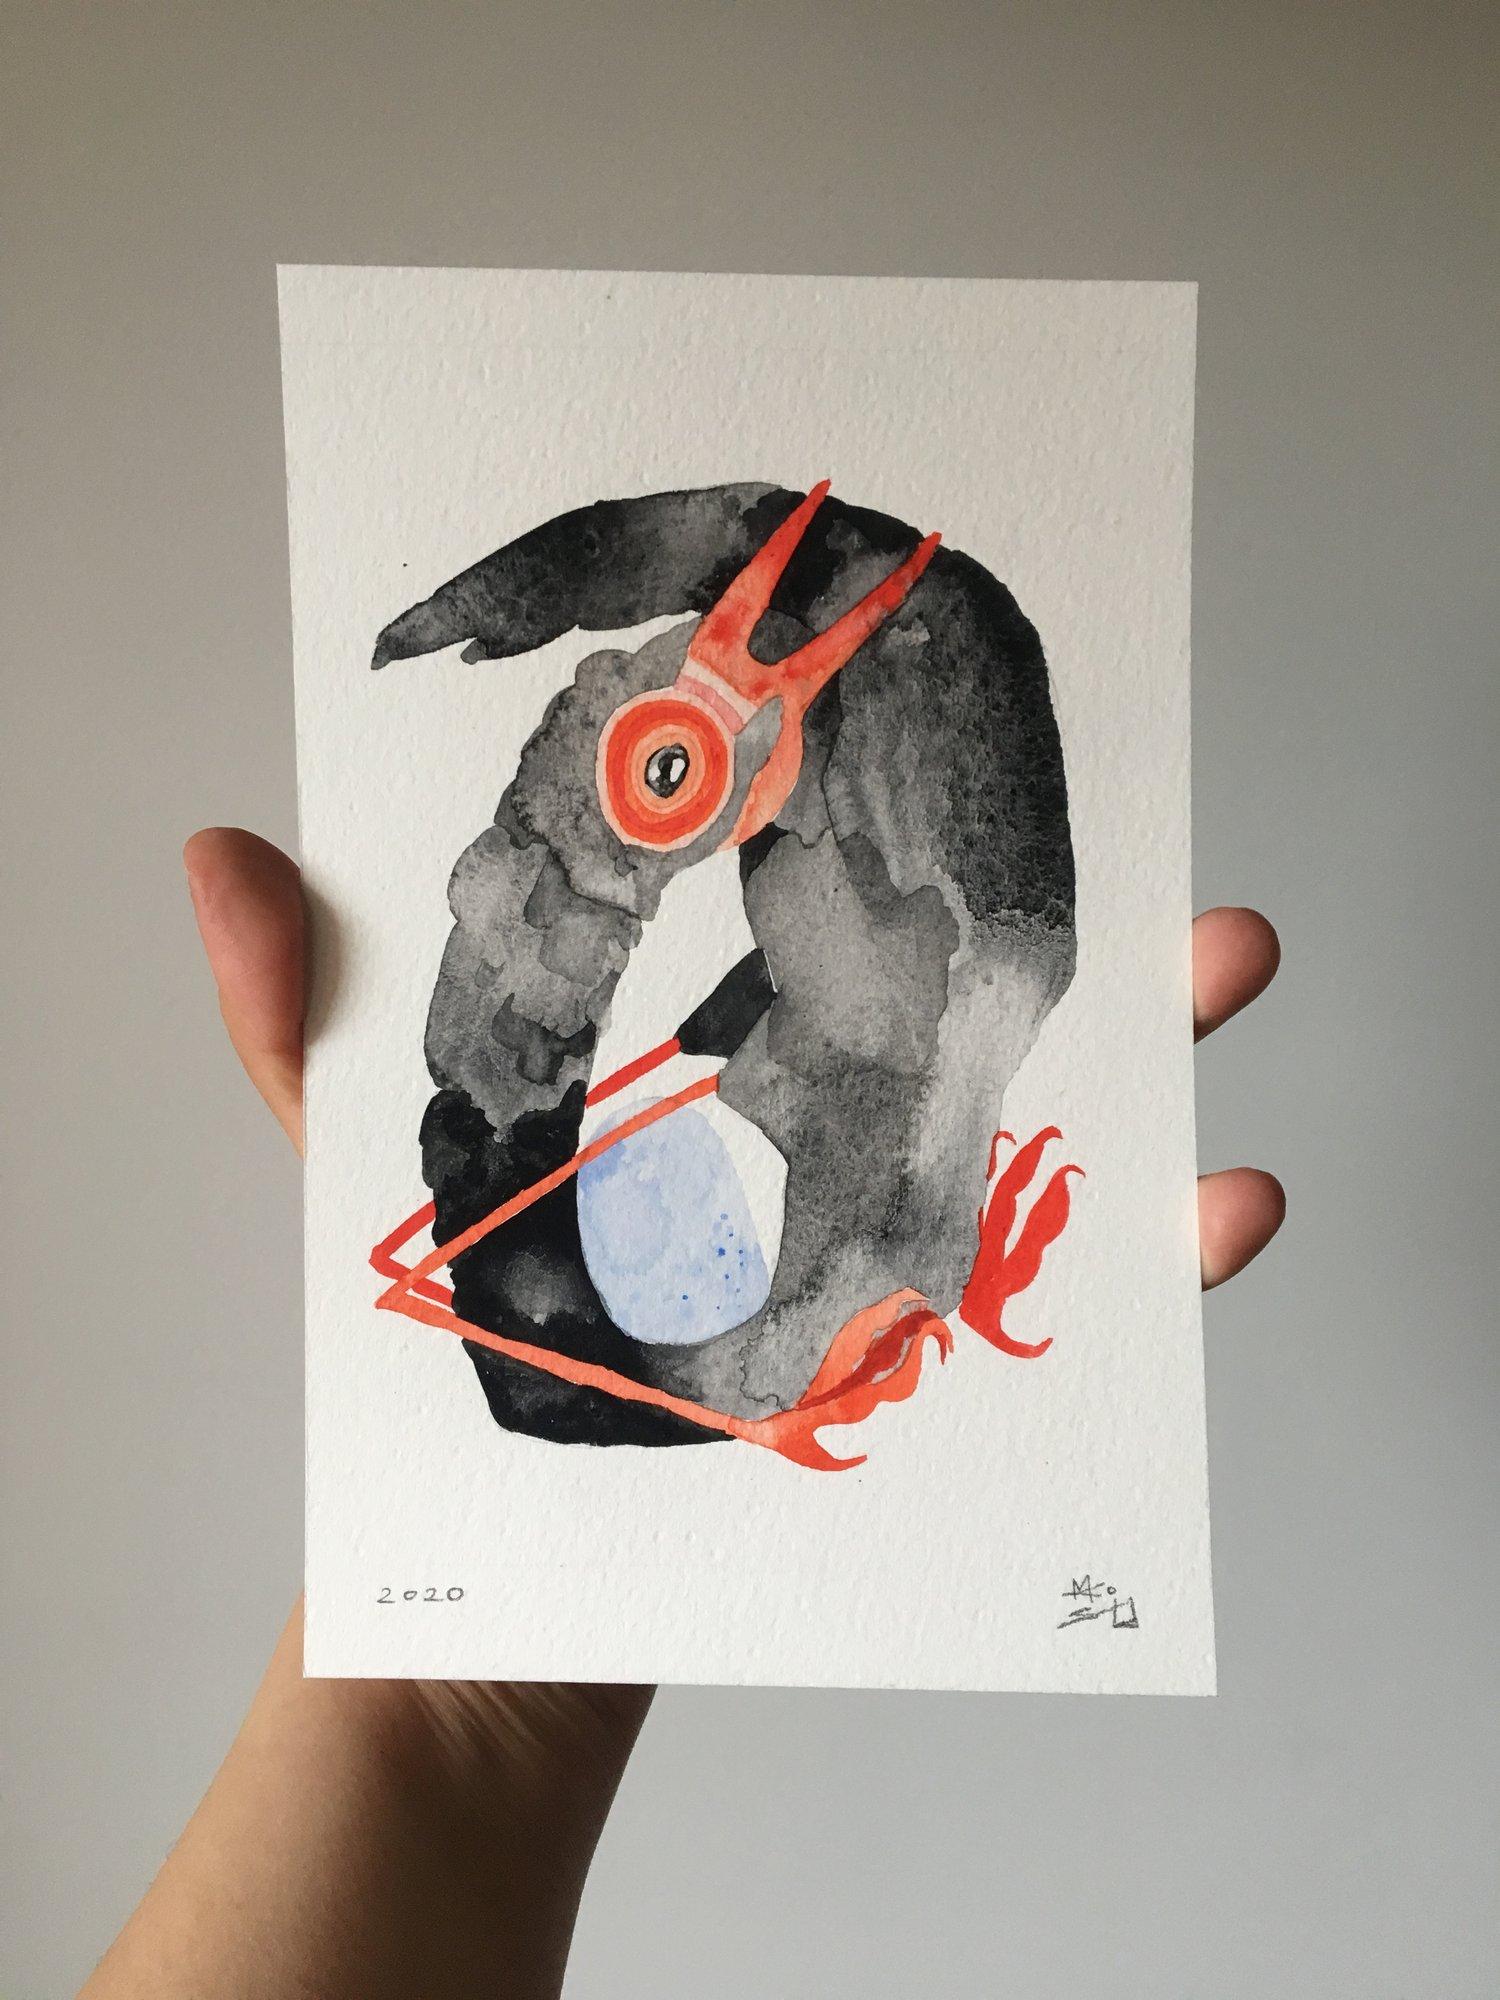 Strange bird with egg, 2020